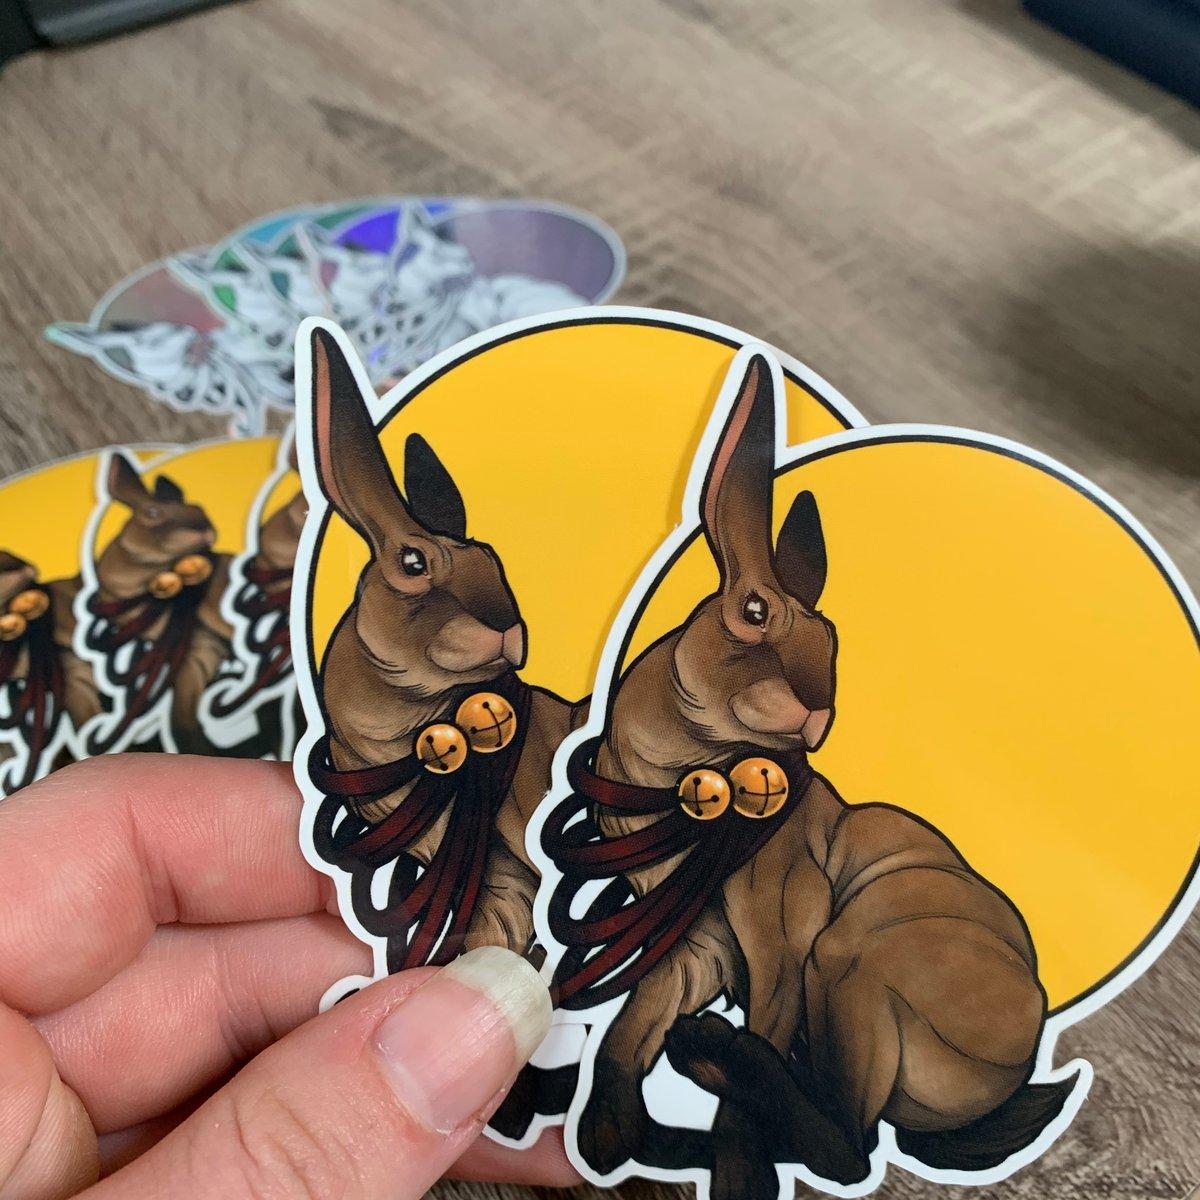 Chubby Bunny Stickers